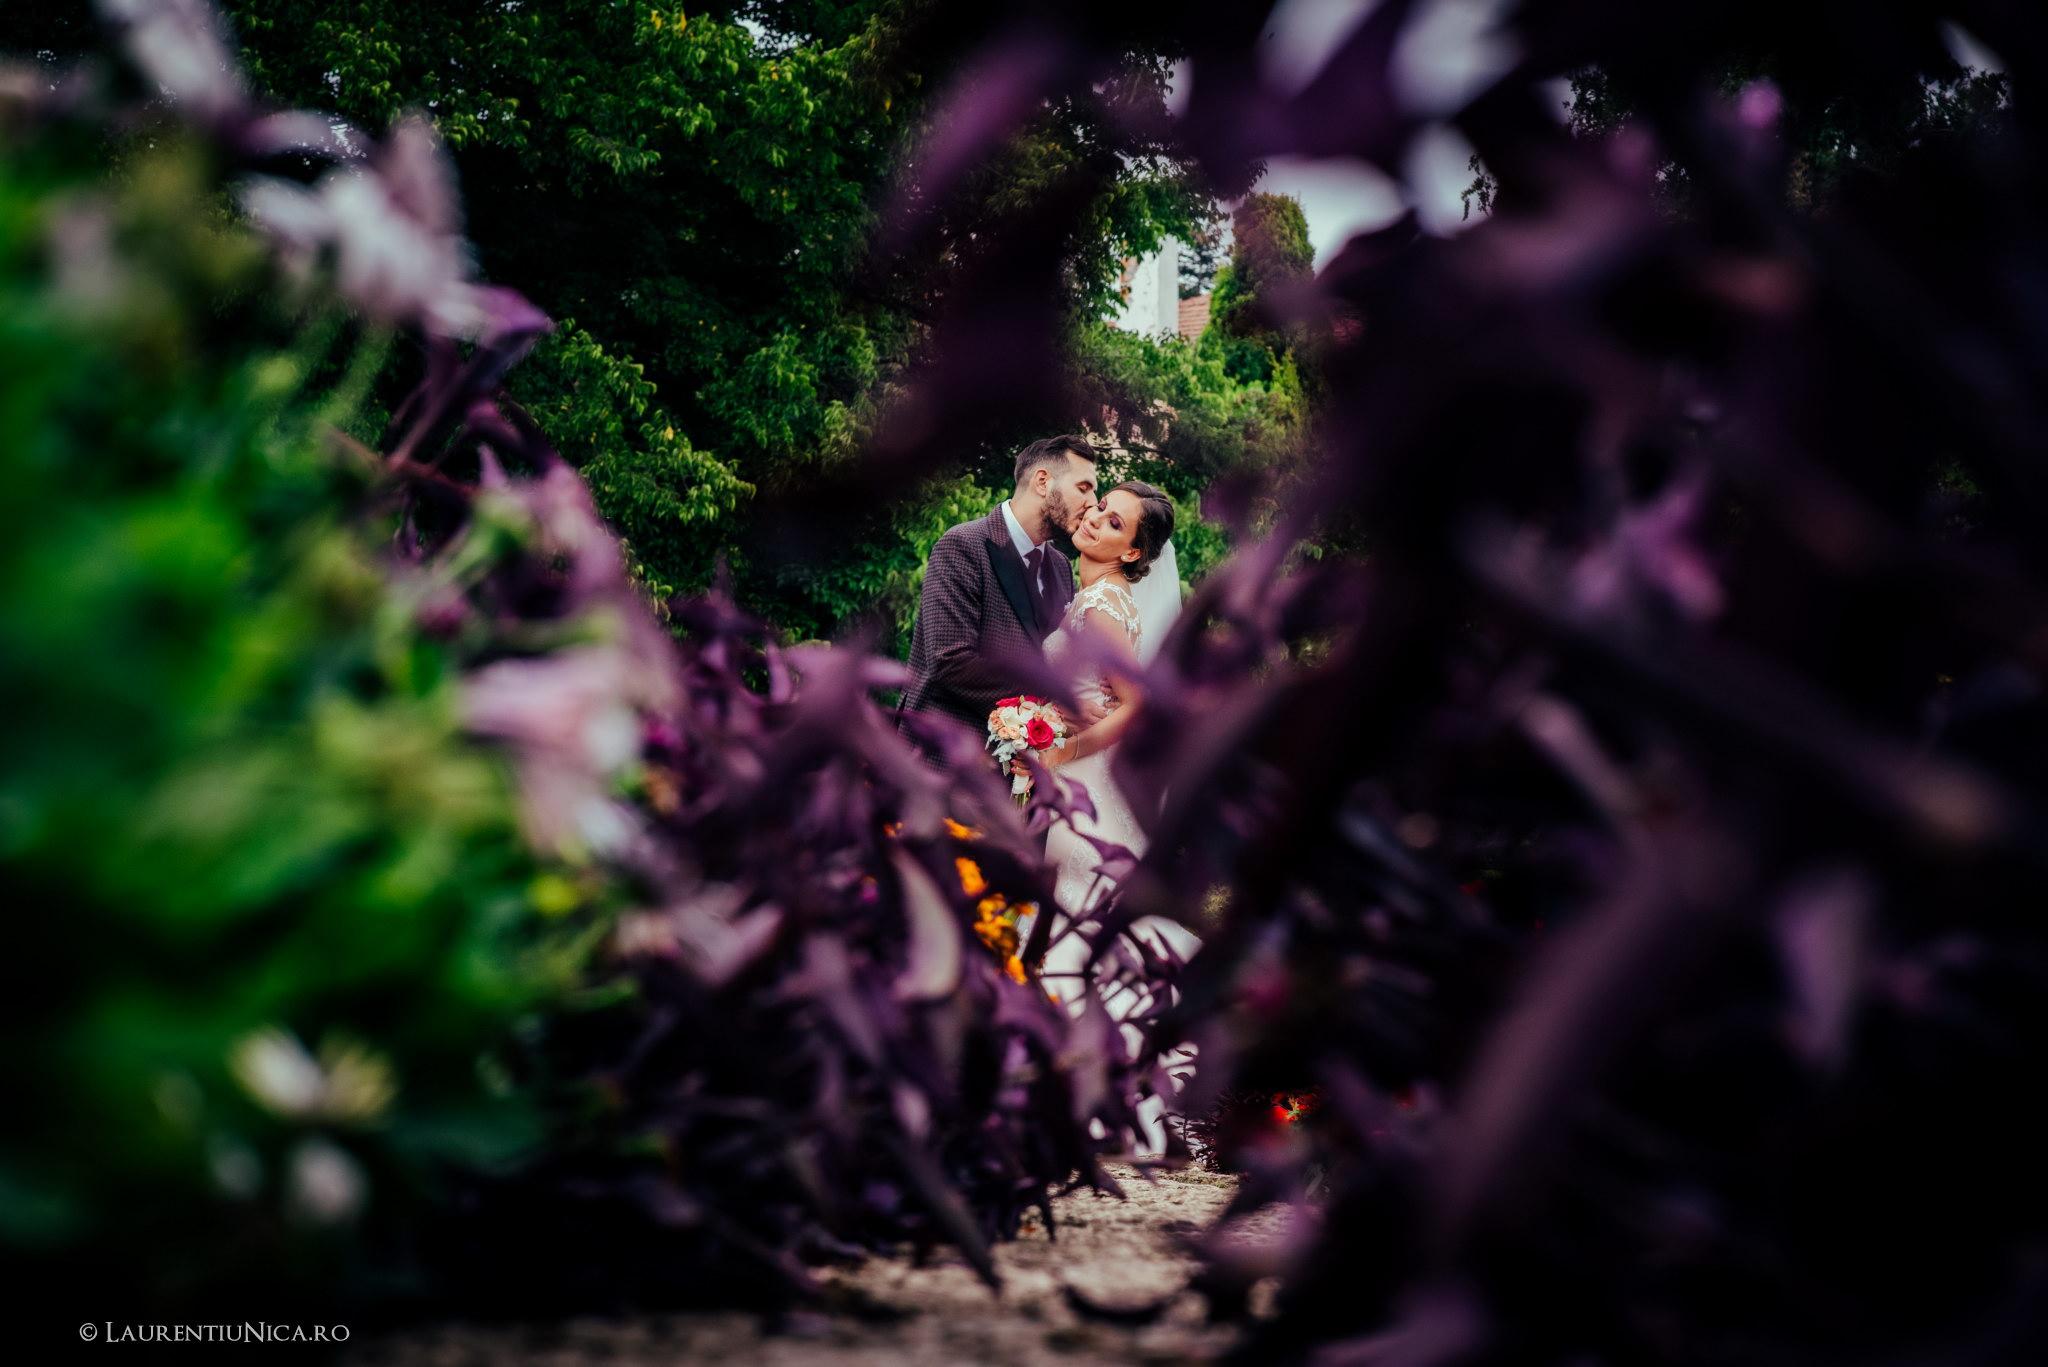 andreea si alin fotografii after wedding balchik bulgaria11 - Andreea & Alin | Fotografii After Wedding | Balchik Bulgaria